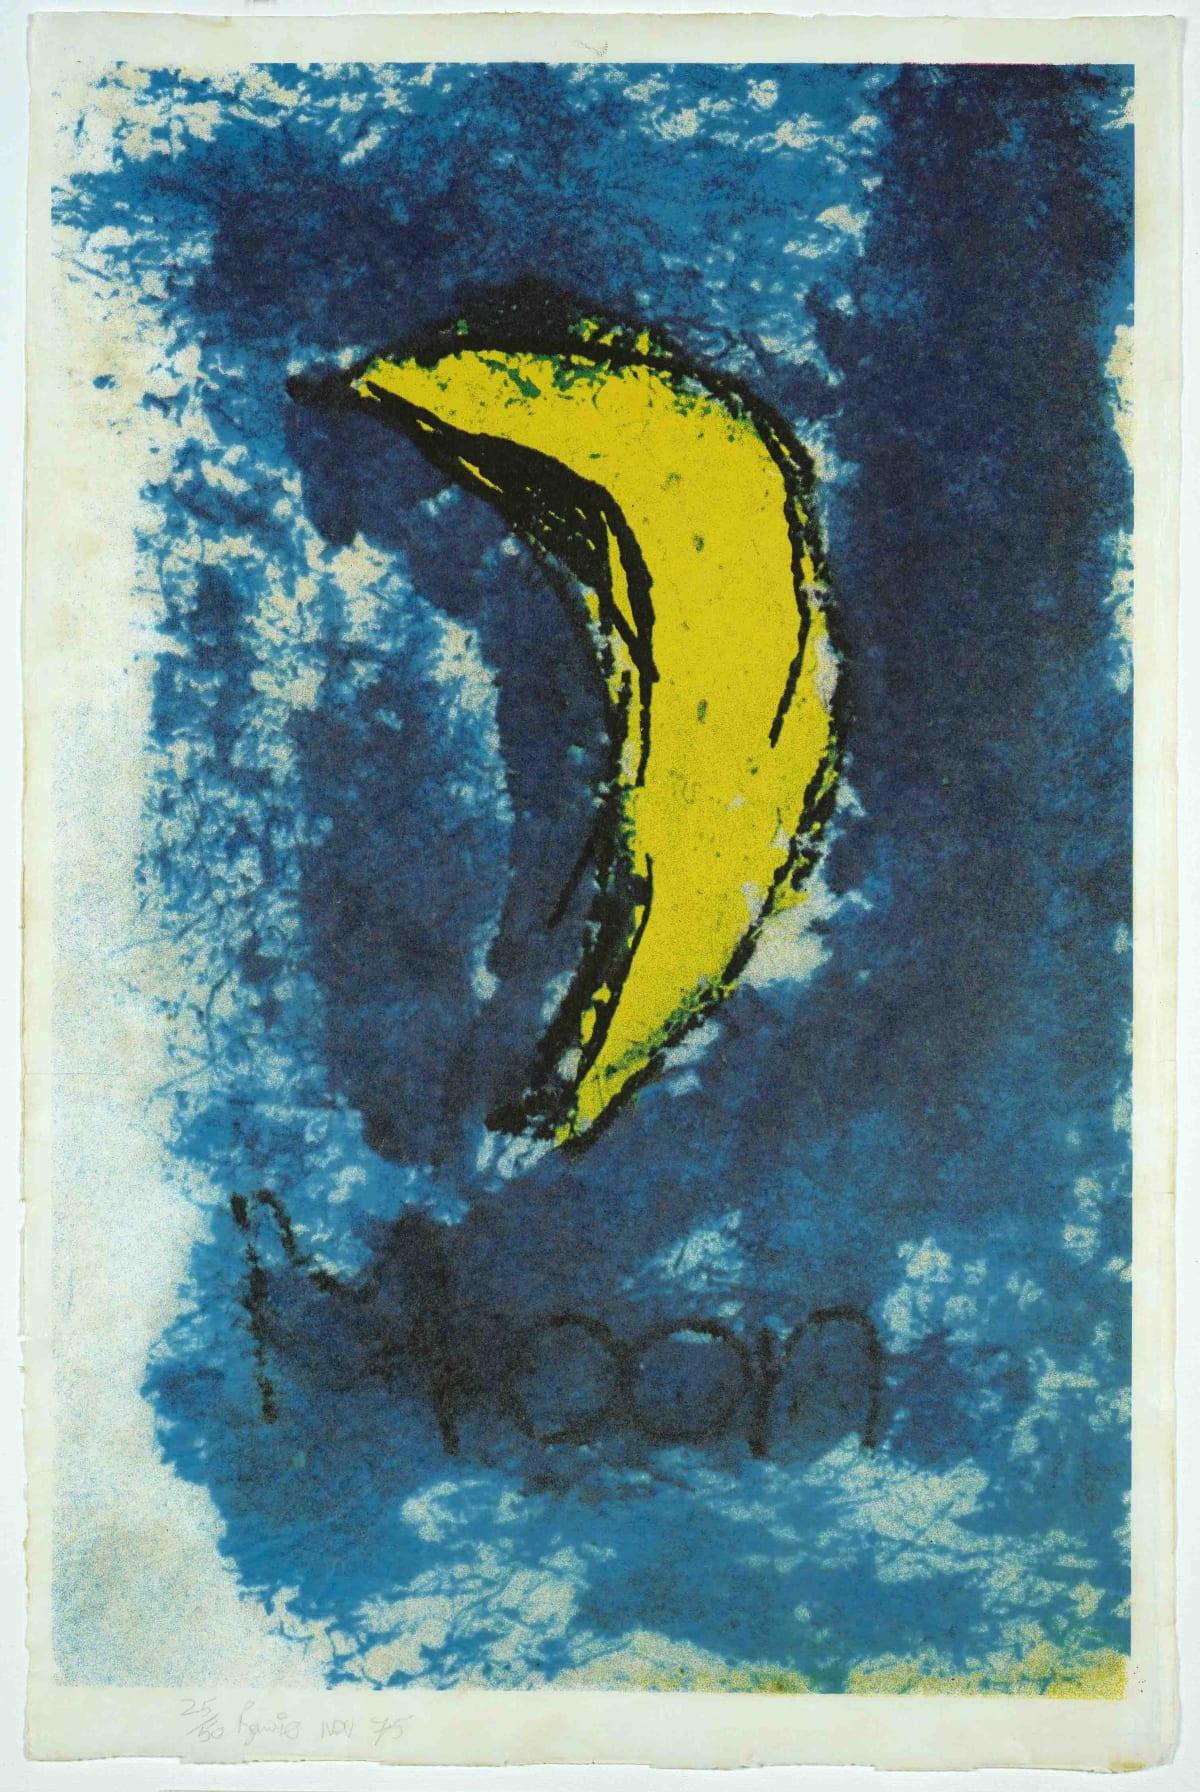 David Bowie, Moon, 1975